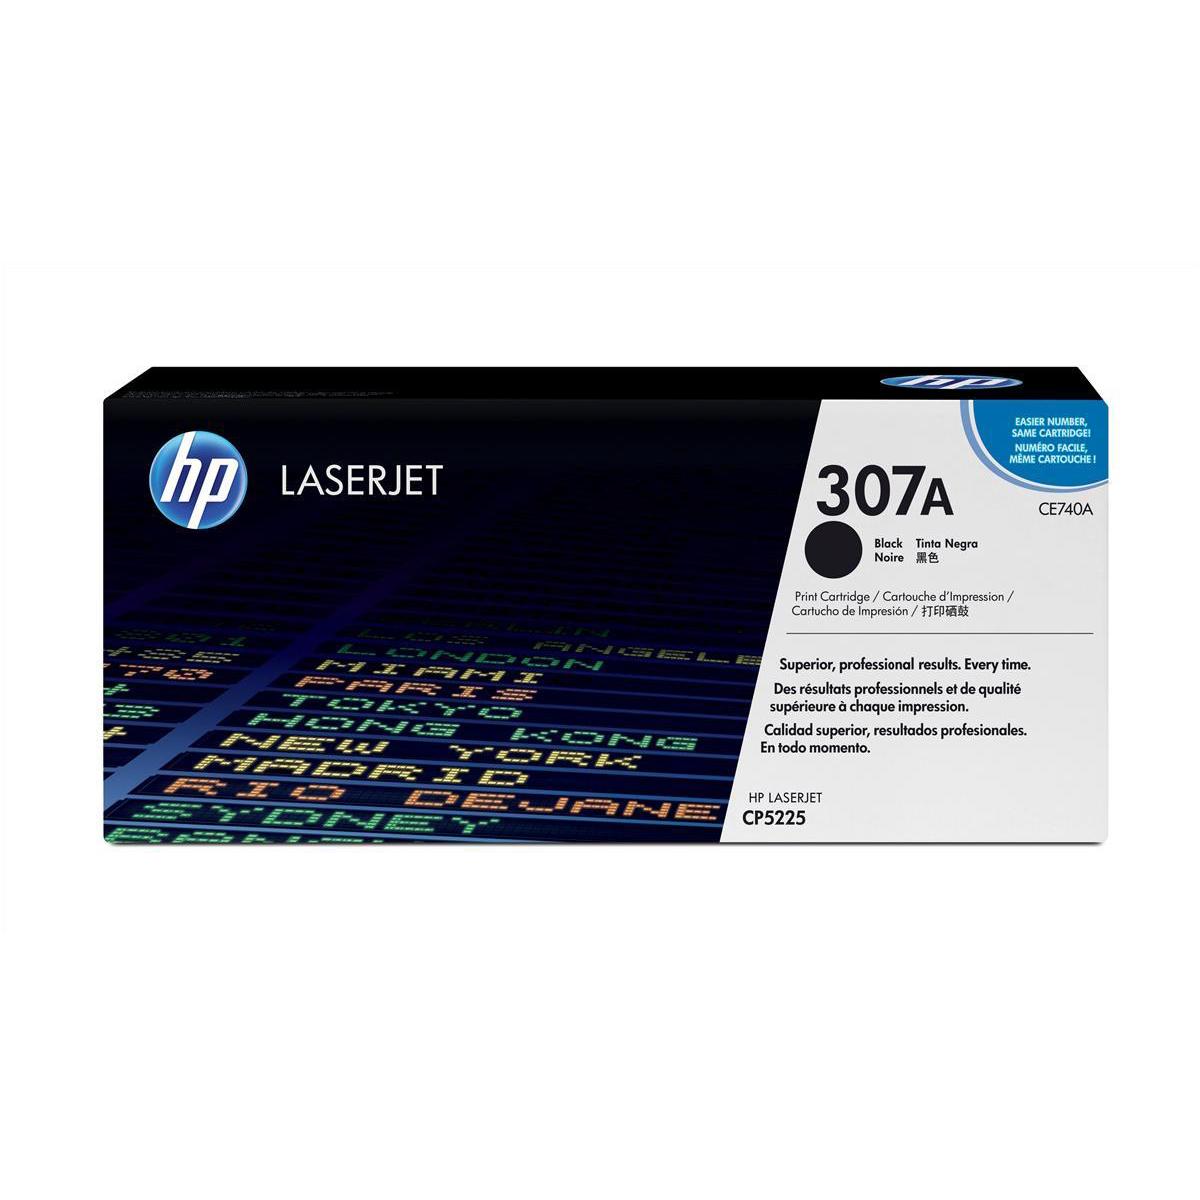 Hewlett Packard [HP] No. 307A Laser Toner Cartridge Page Life 7000pp Black Ref CE740A